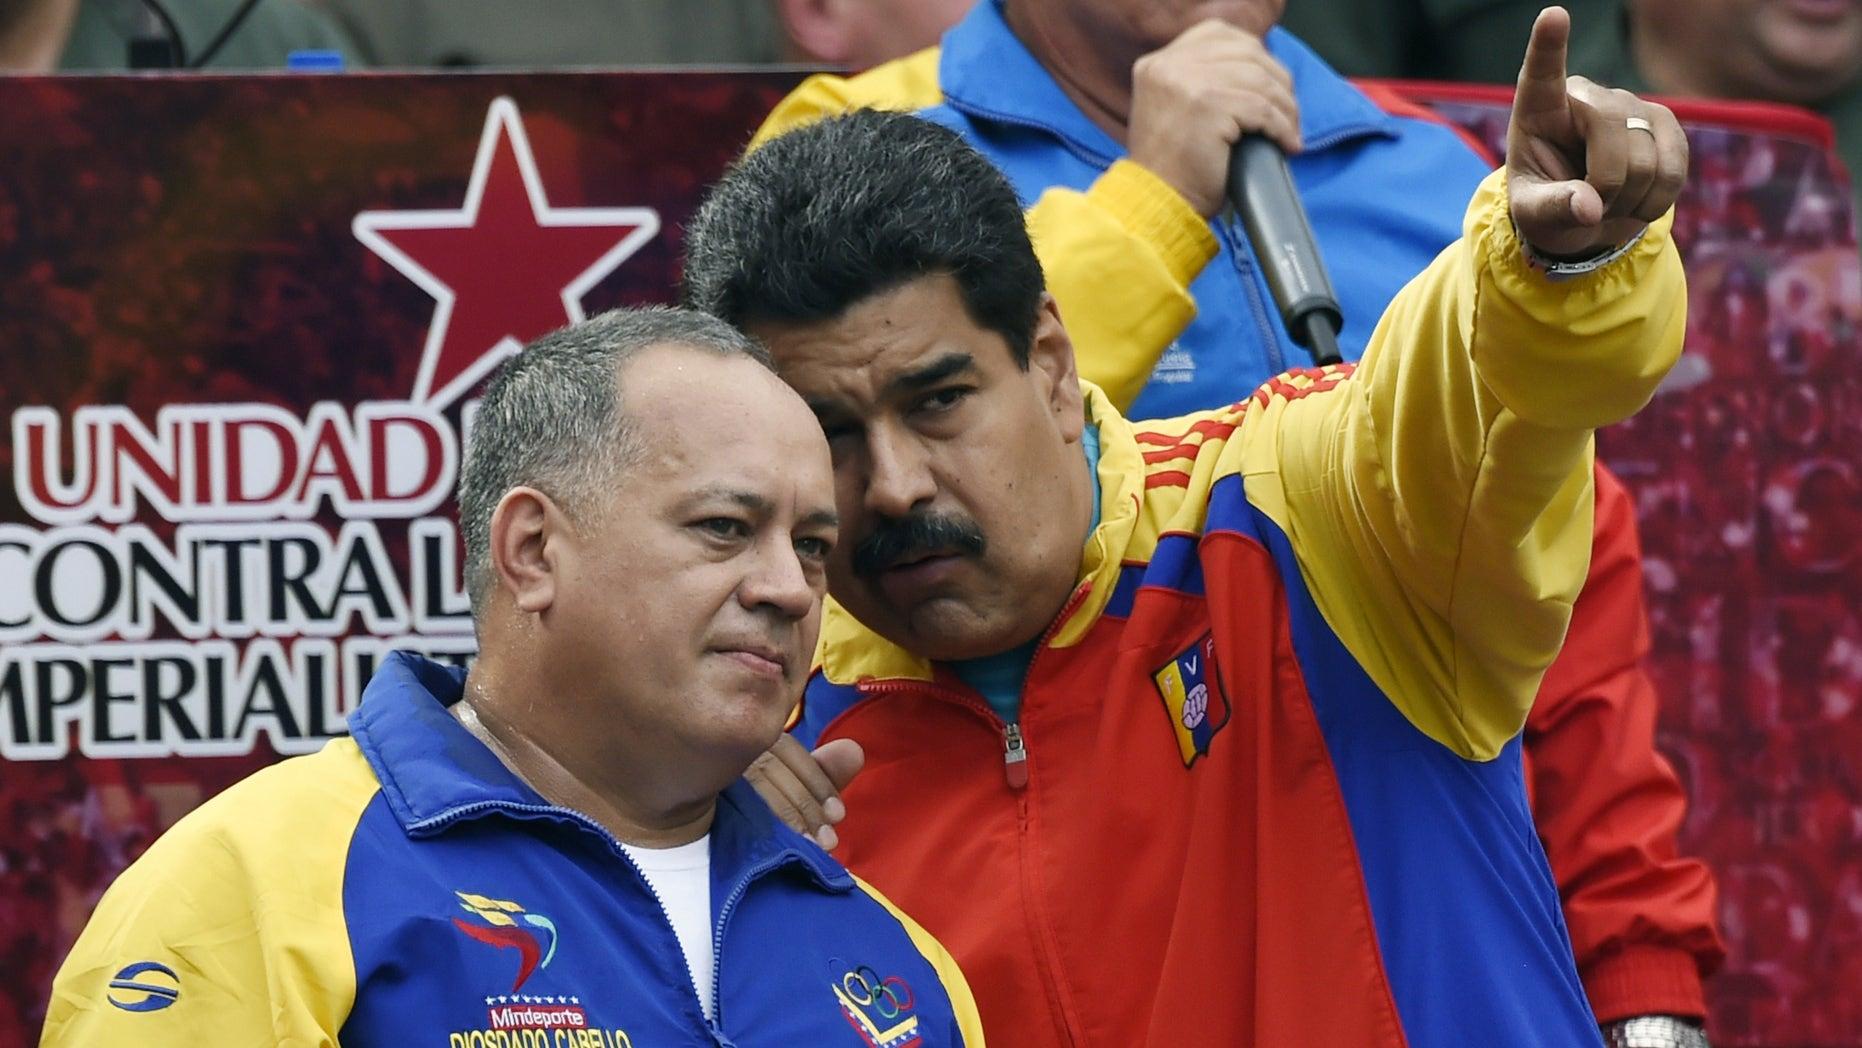 Venezuelan President Nicolas Maduro and Cabello in Caracas on March 15, 2015.